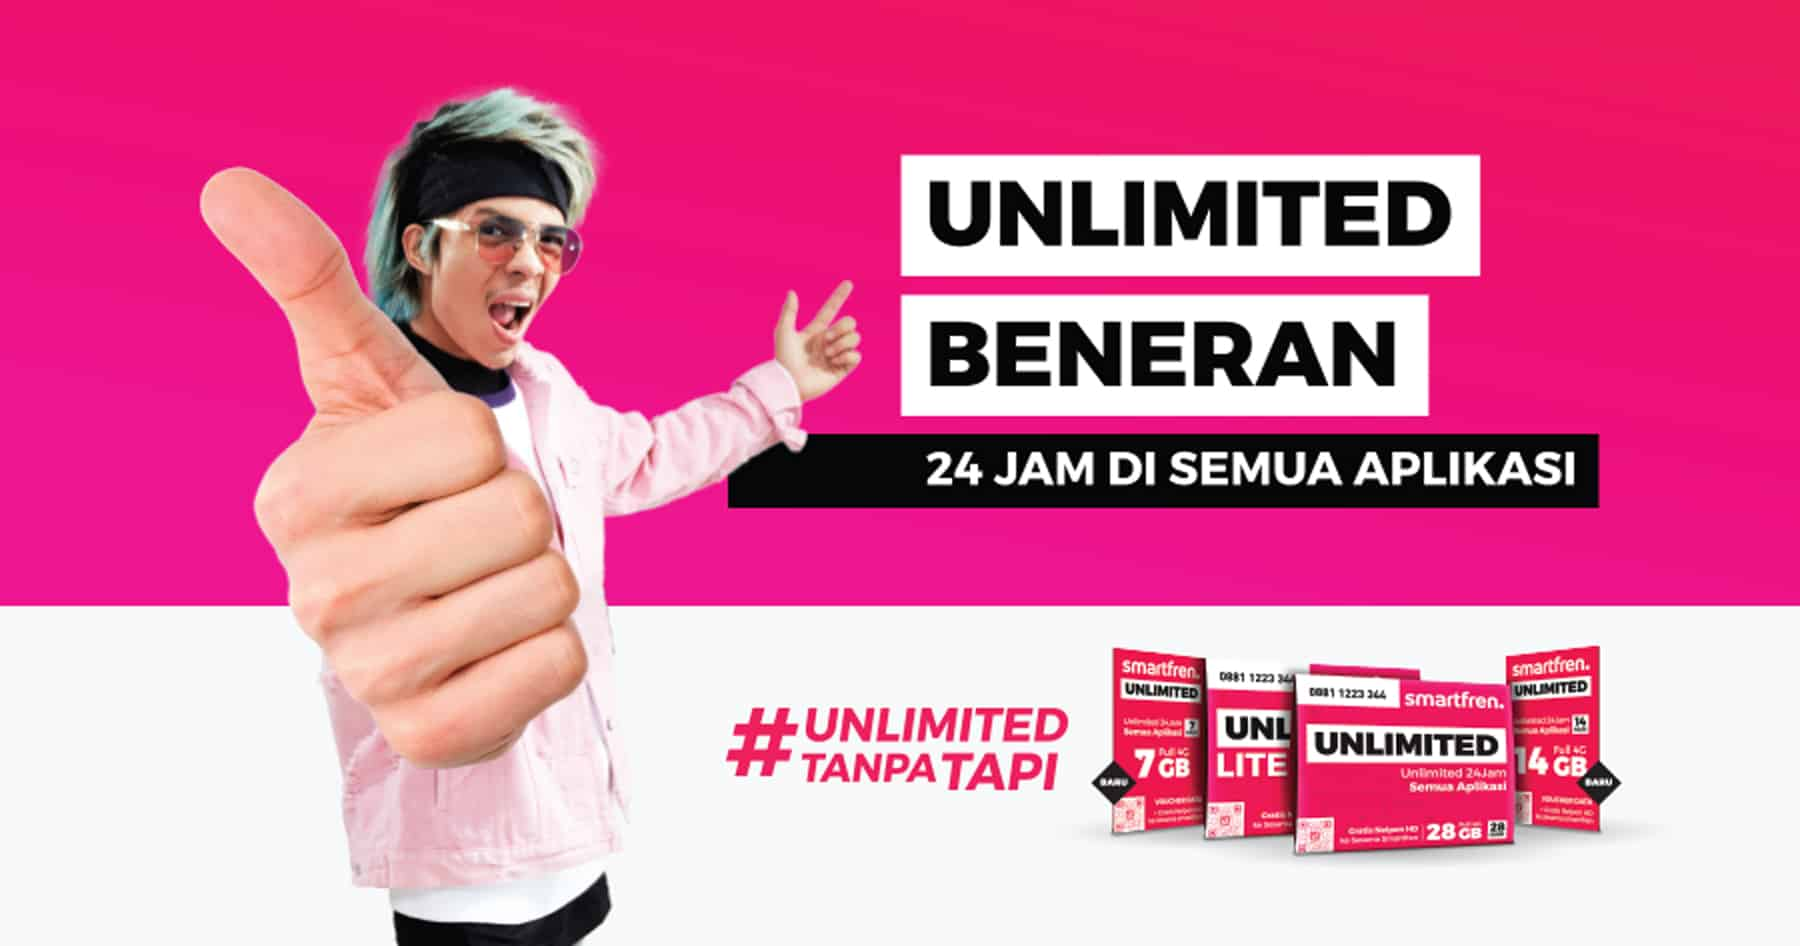 APN-Smartfren-Unlimited